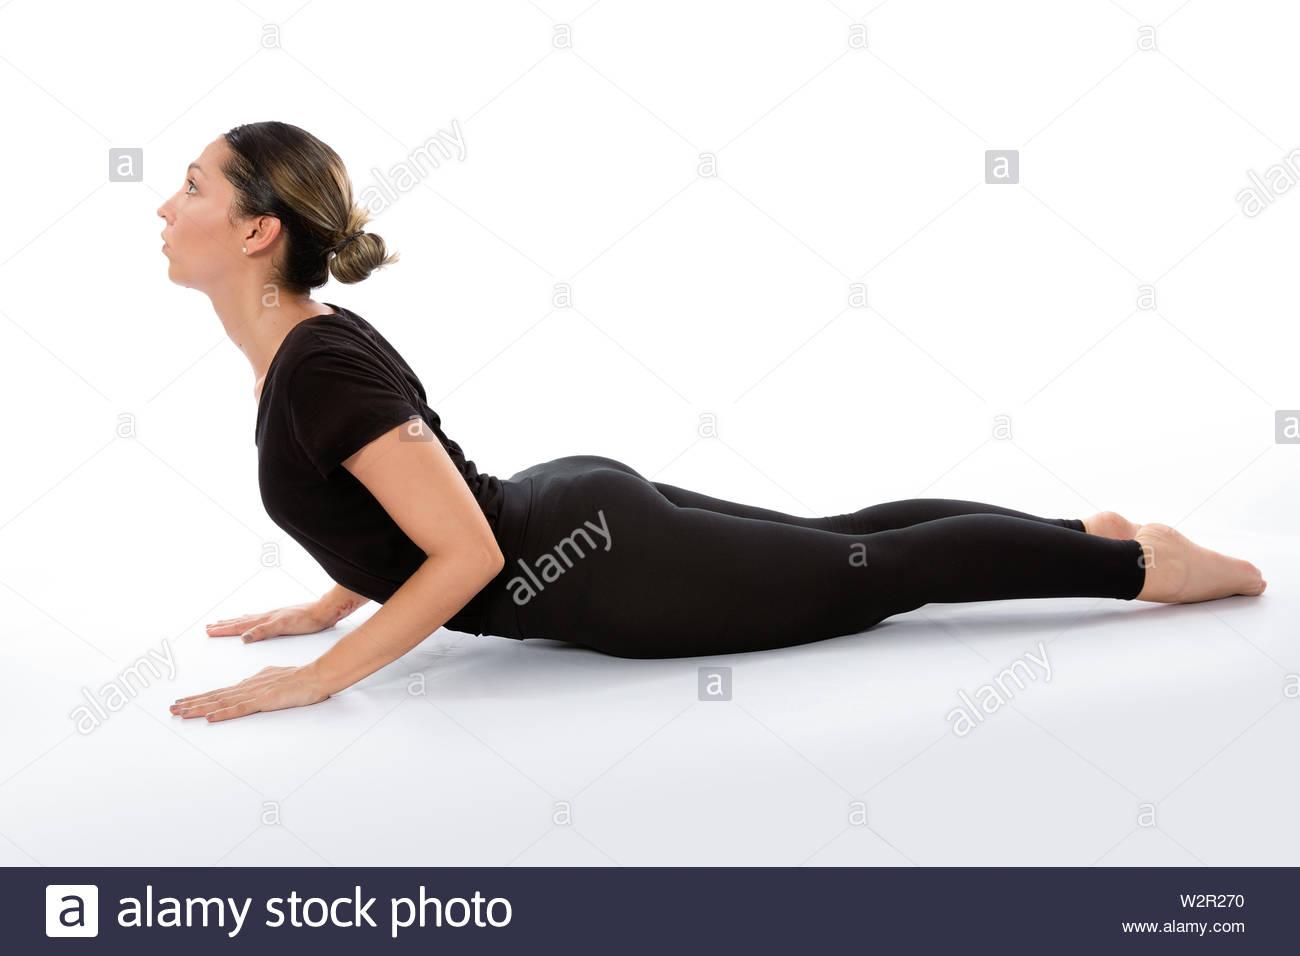 Bhujangasana (Cobra Pose). Yoga poses woman isolated with white background. Yoga pose set. Mindfulness and Spiritually concept. Girl practicing Hatha - Stock Image